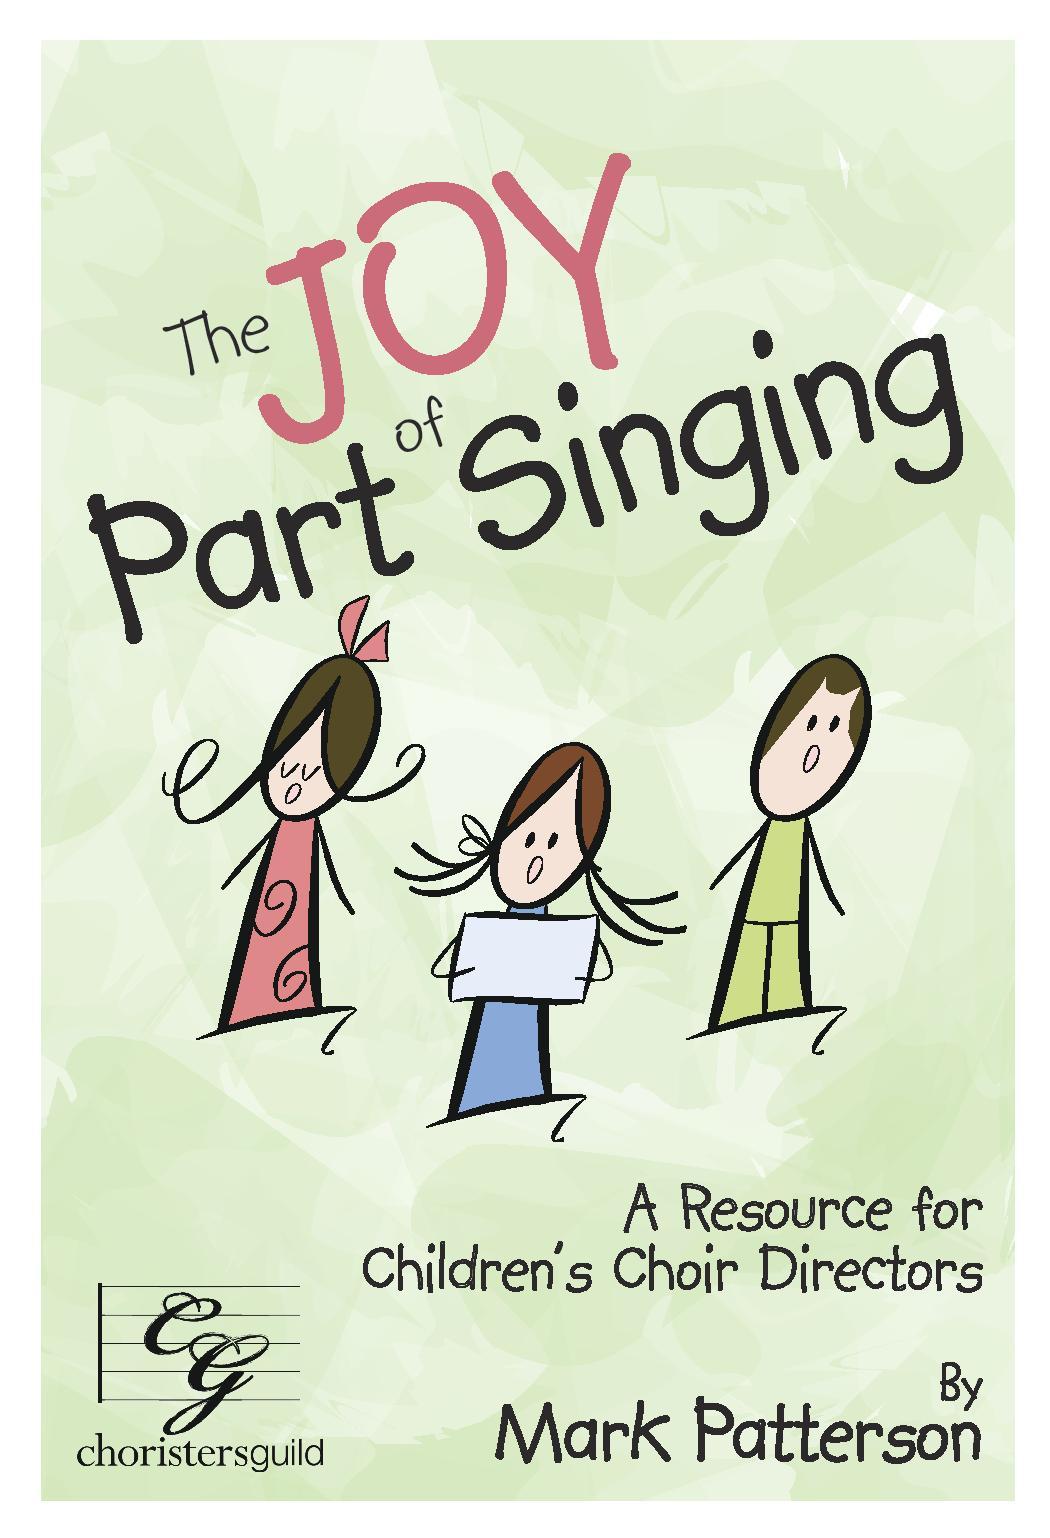 The Joy of Part Singing